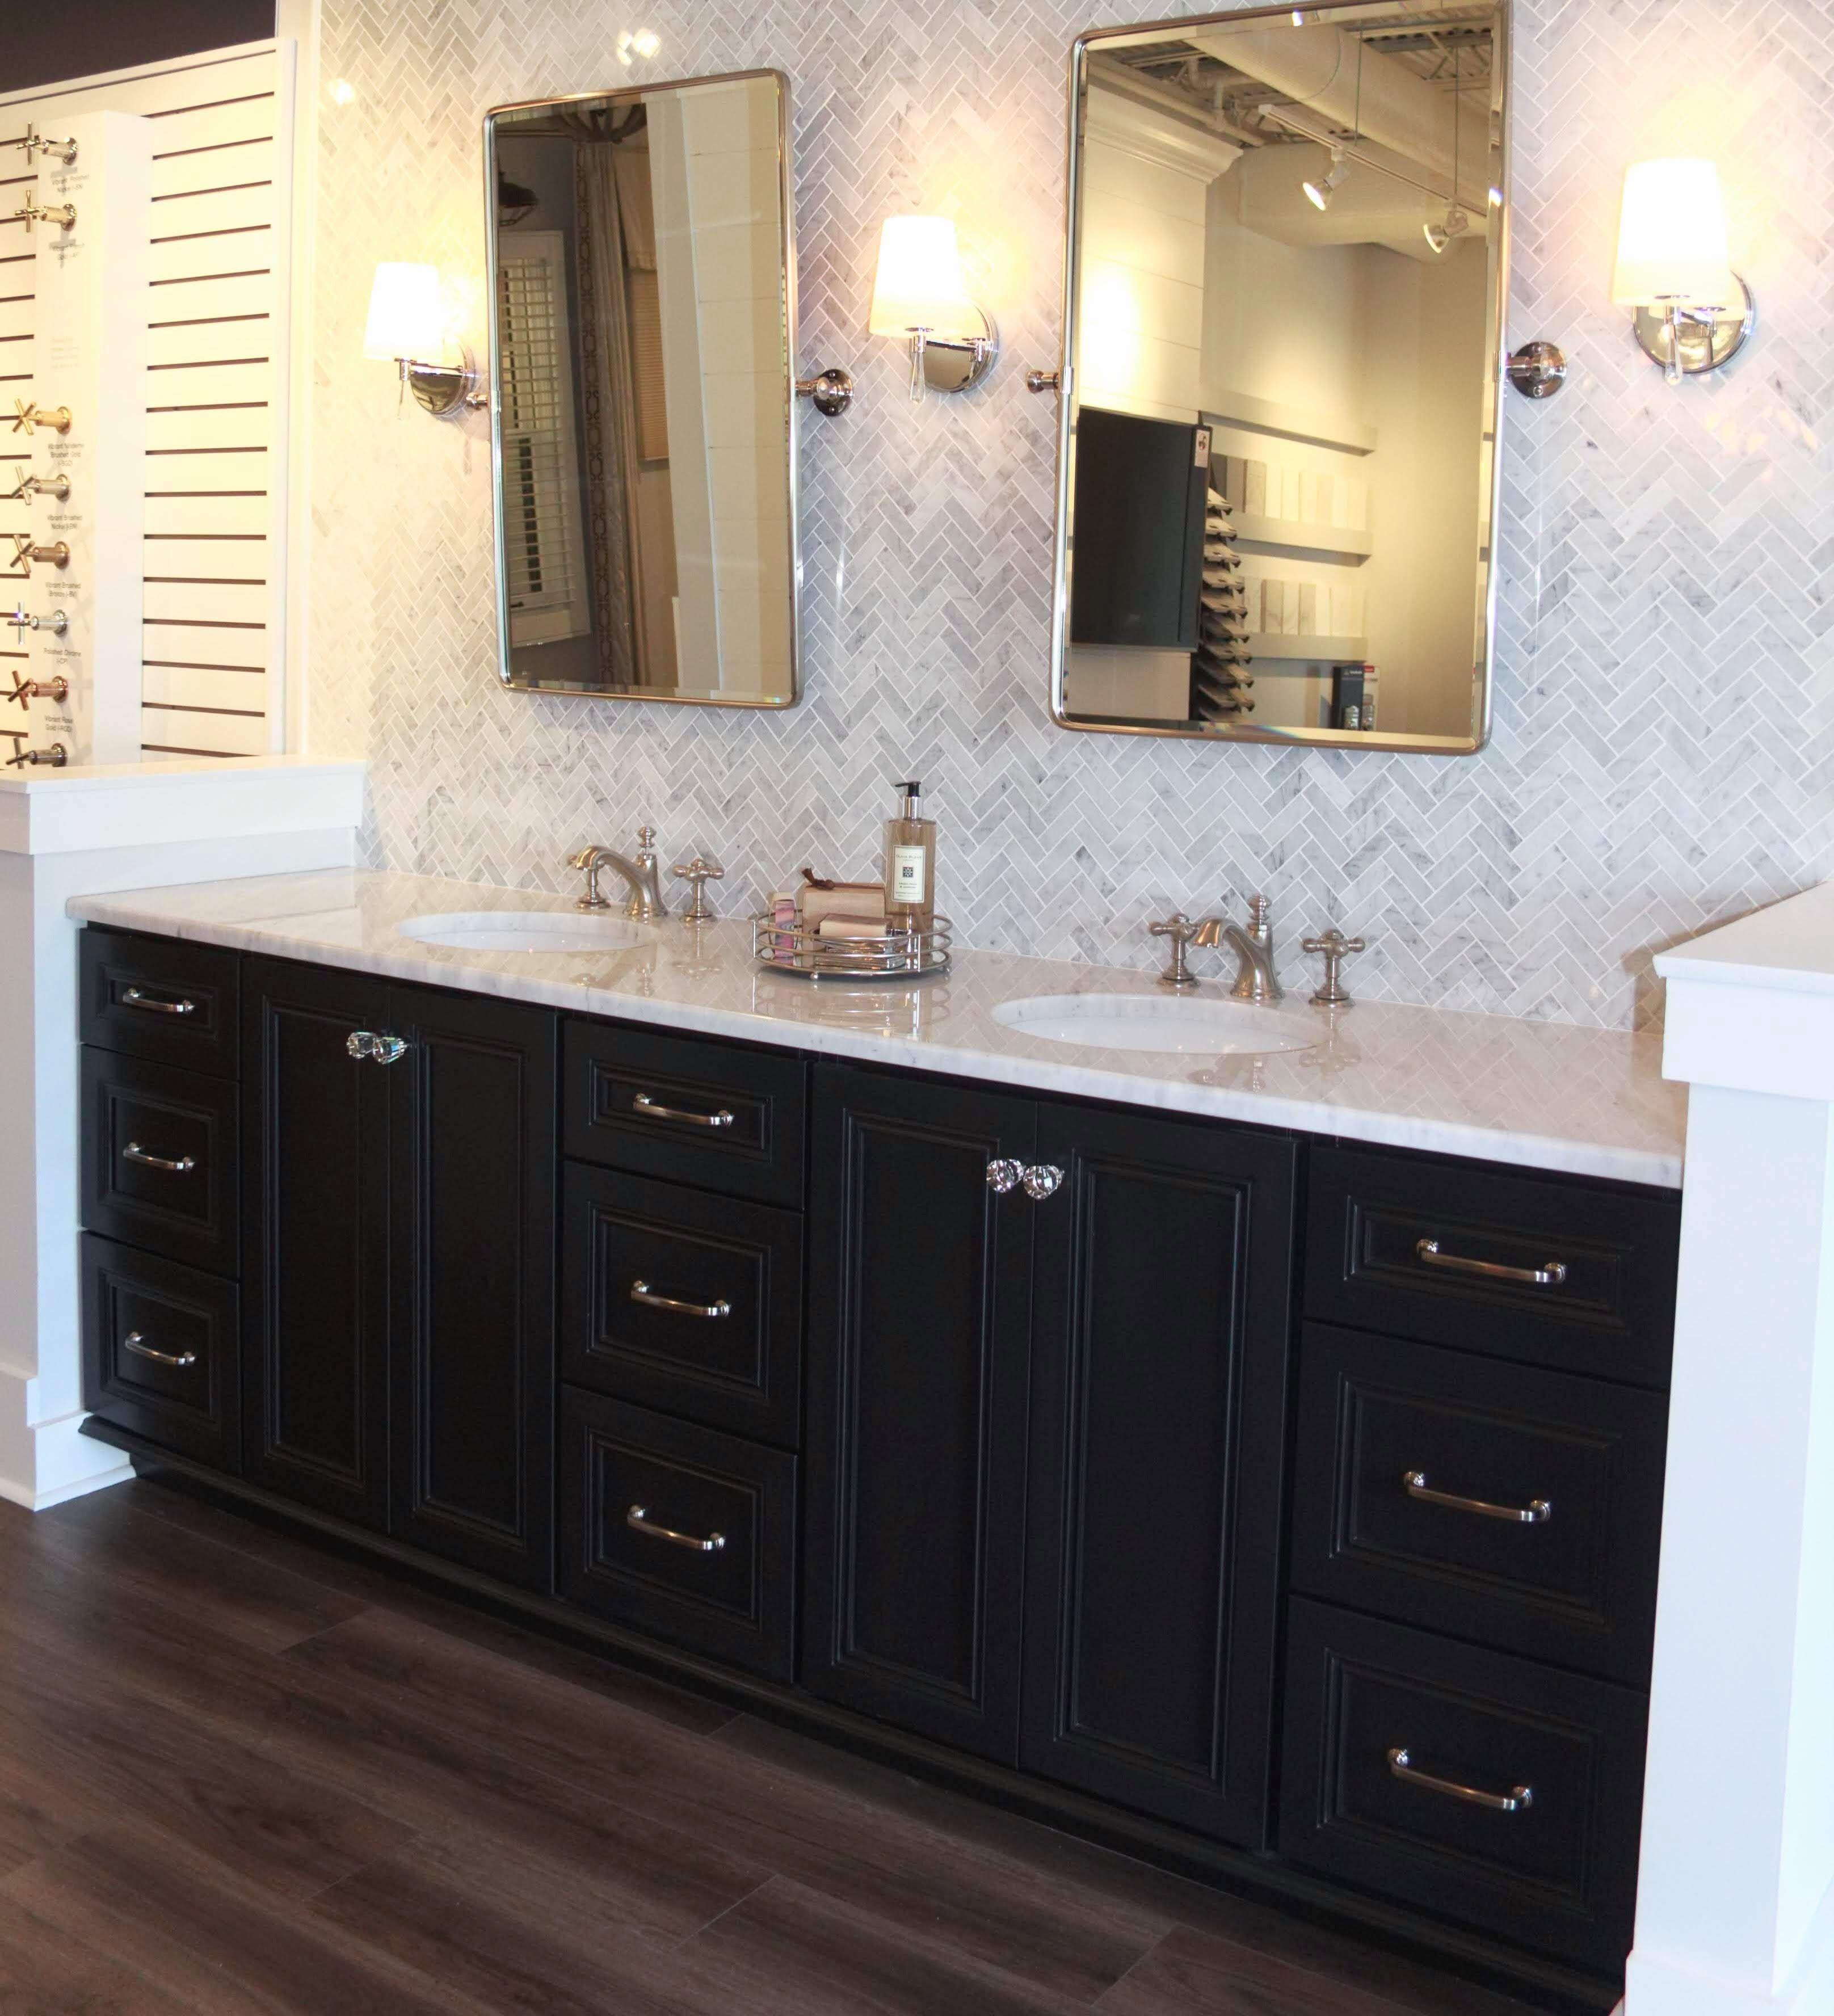 Vanity Bathroom Inspiration Century featured